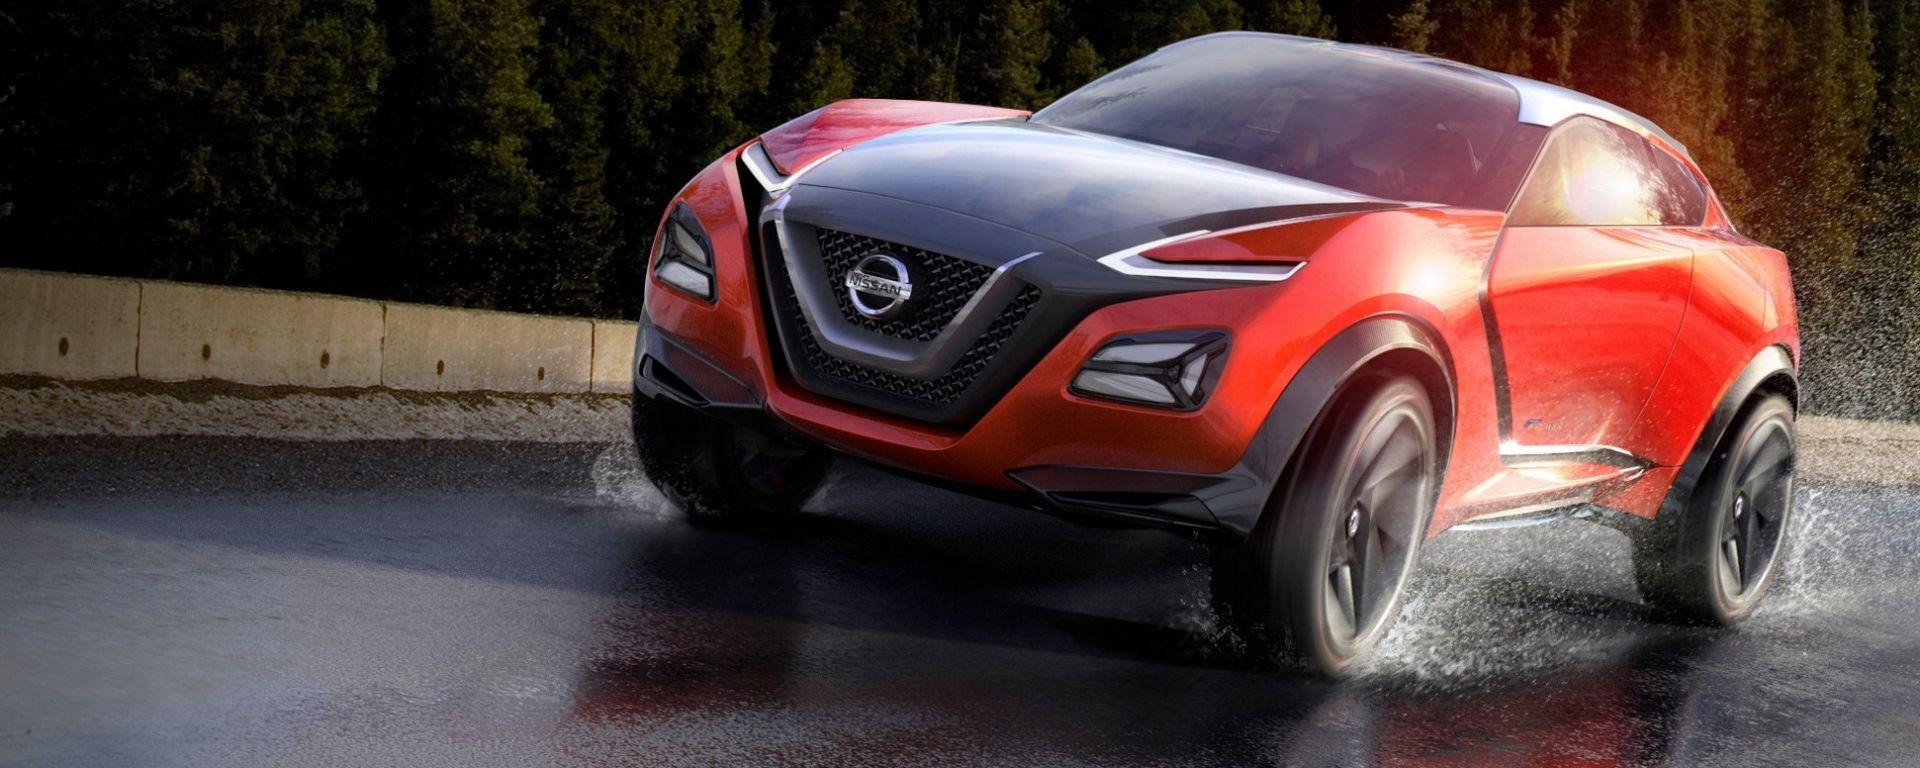 Nuova Nissan Juke 2019: nuovi motori, prezzo, tempi di ...